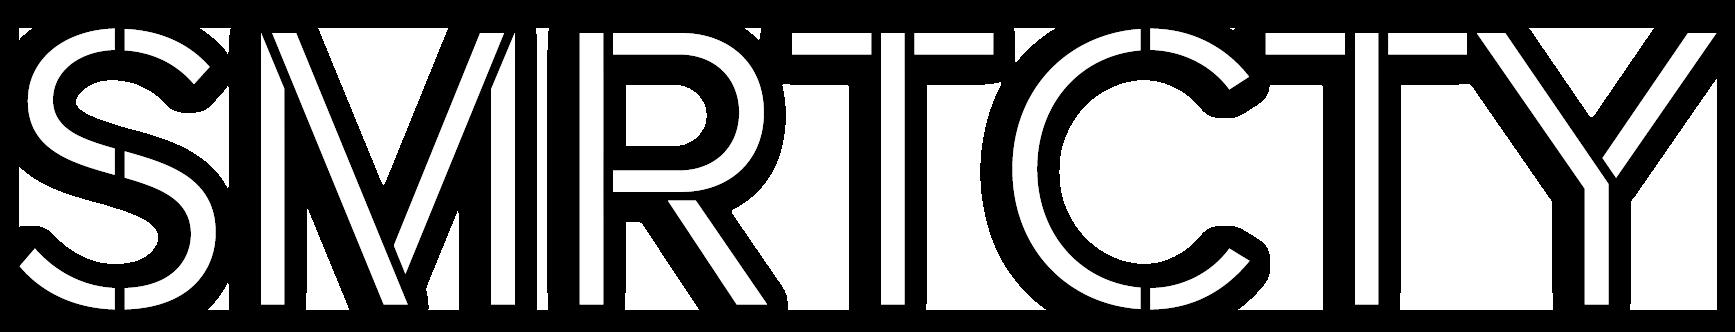 Mississauga Smart City Logo